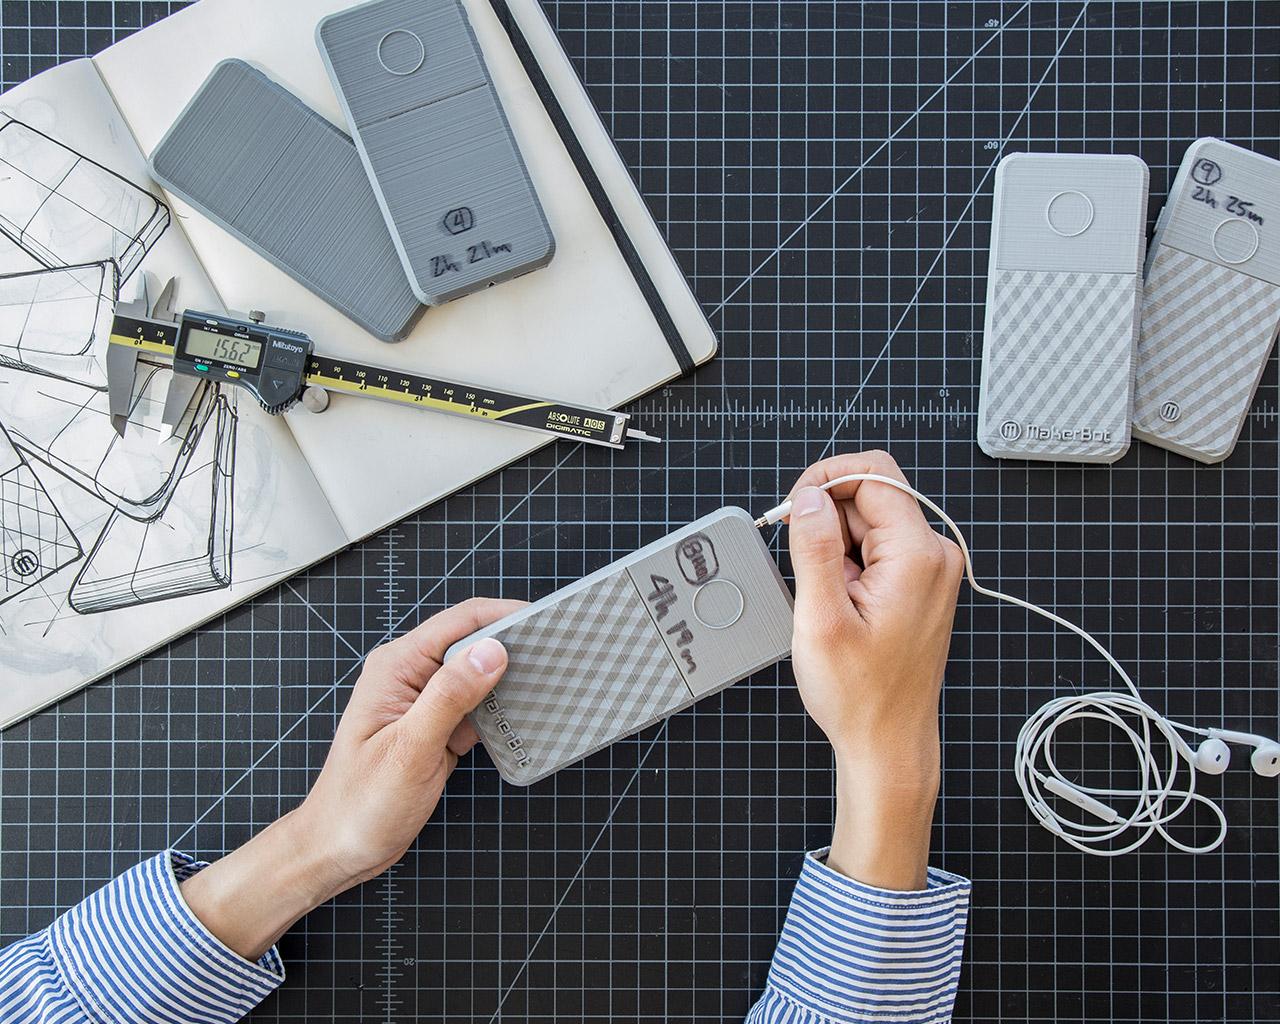 MakerBot Informationen